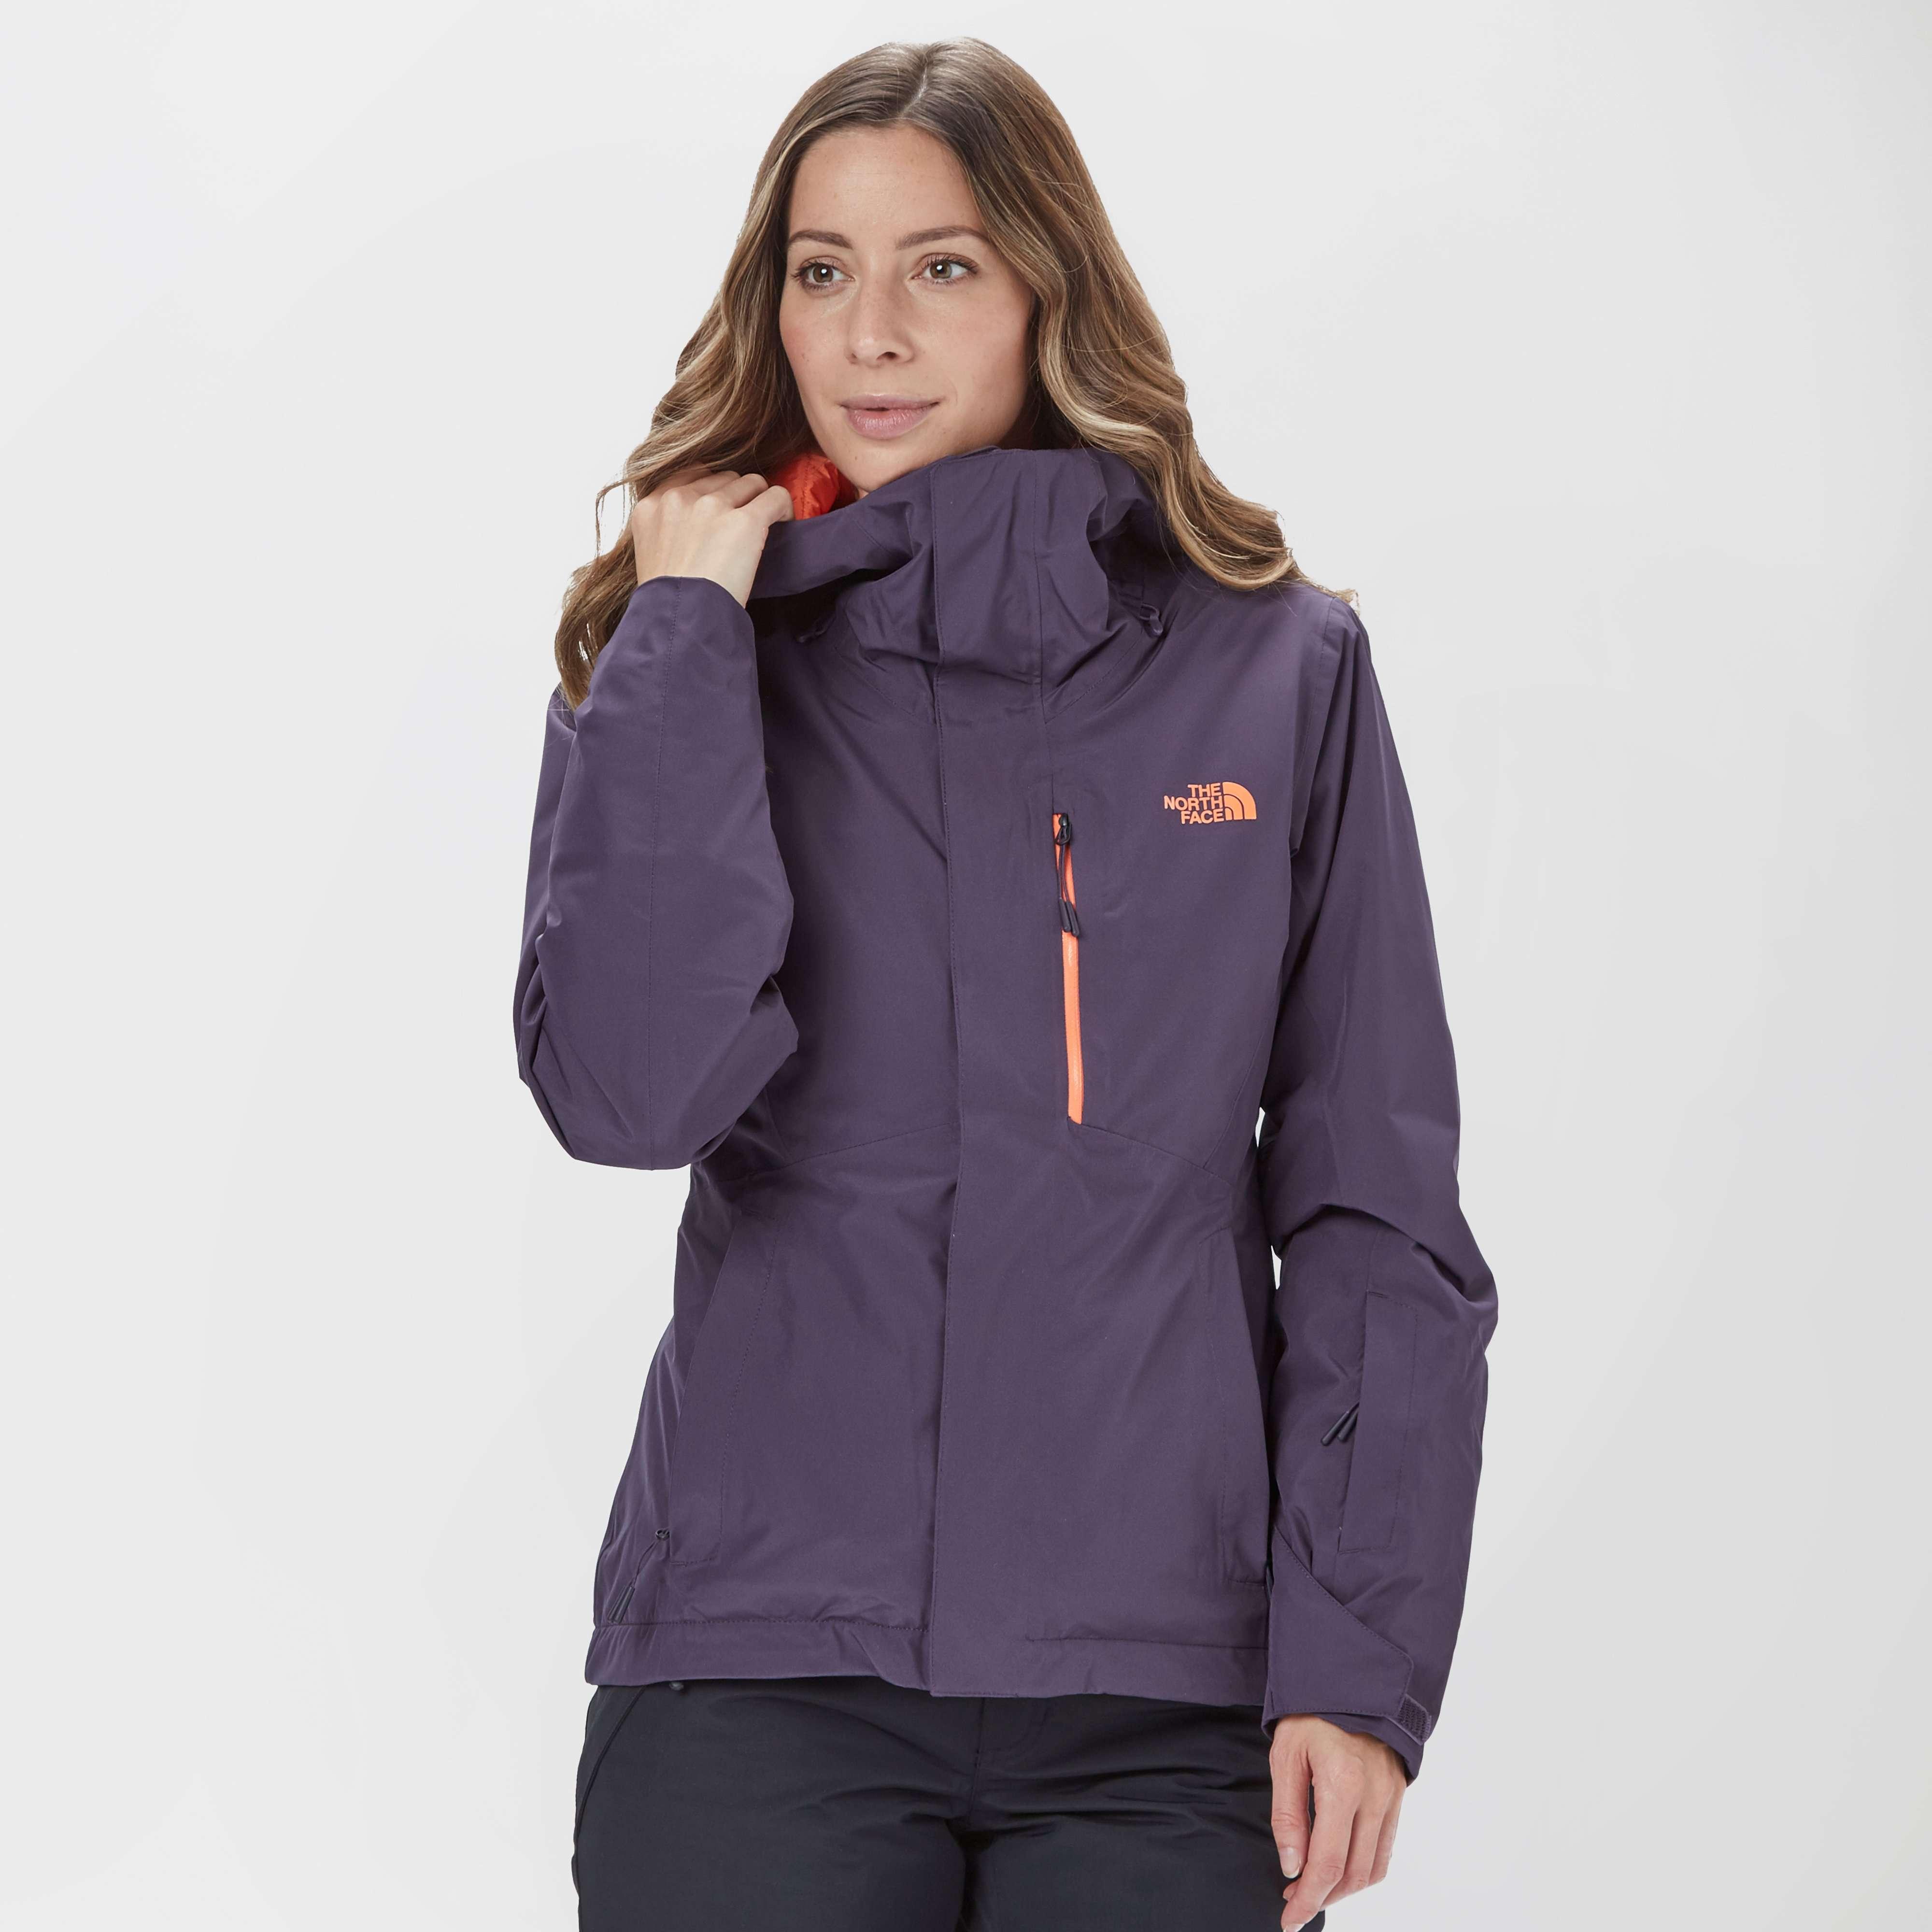 THE NORTH FACE Women's Descendit Ski Jacket